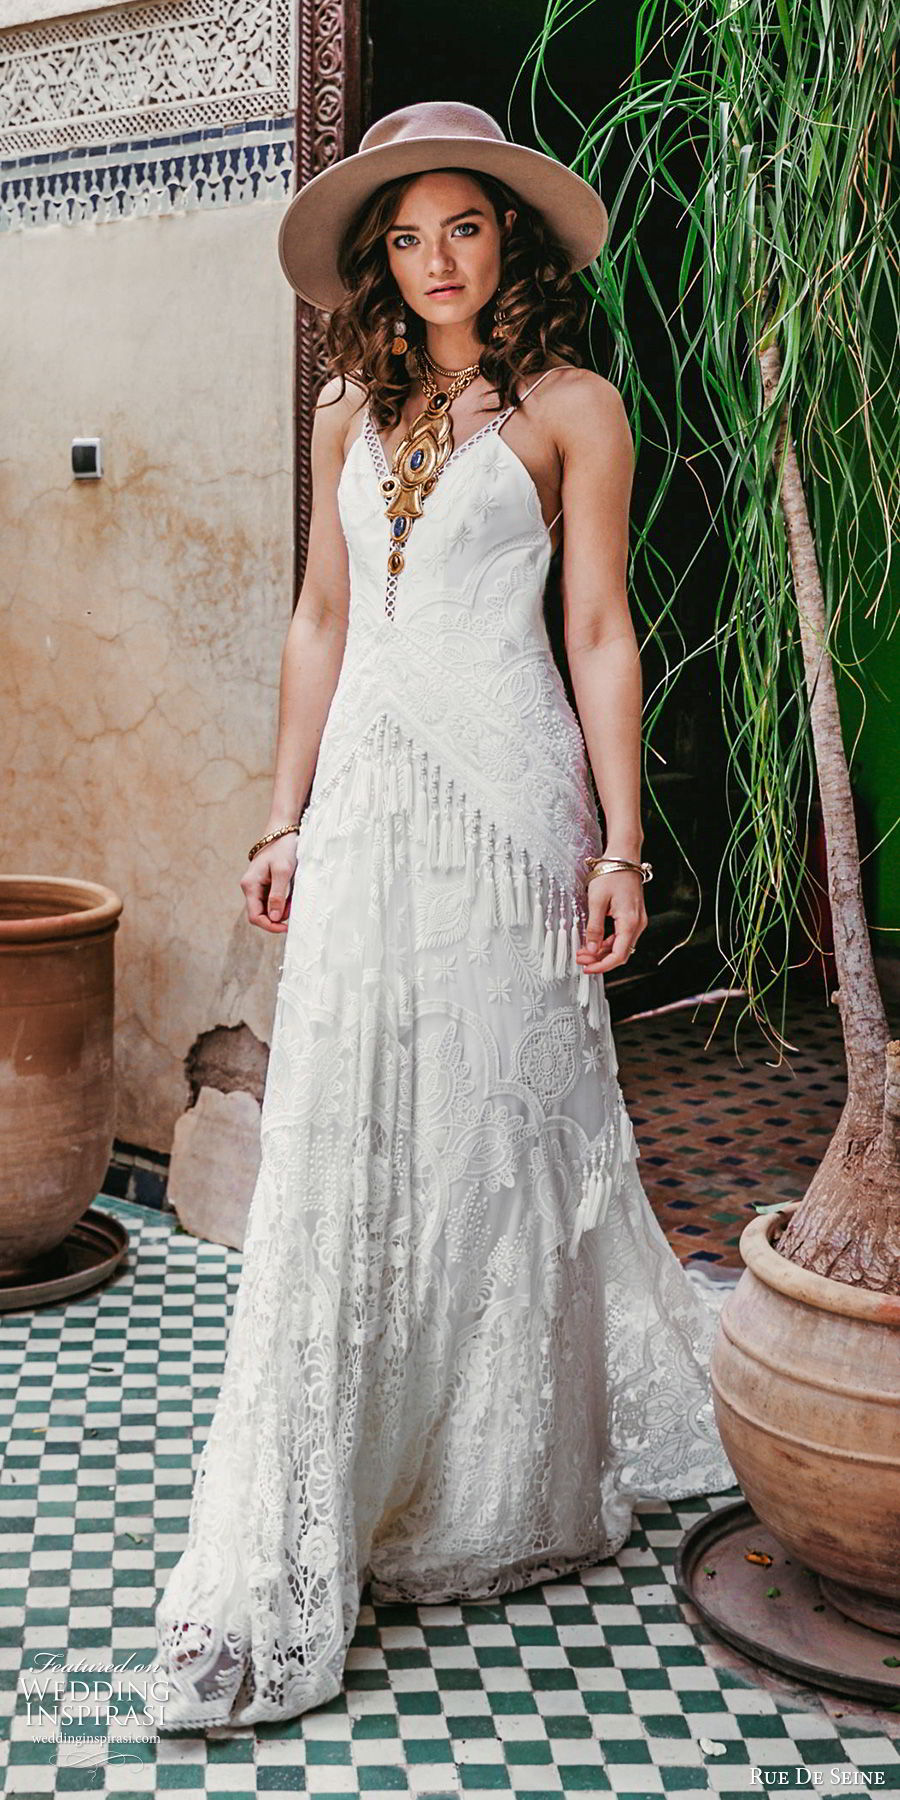 rue de seine 2019 bridal sleeveless thin straps plunging v neckline fully embellished lace modified a line wedding dress (18) boho chic romantic low back chapel train mv